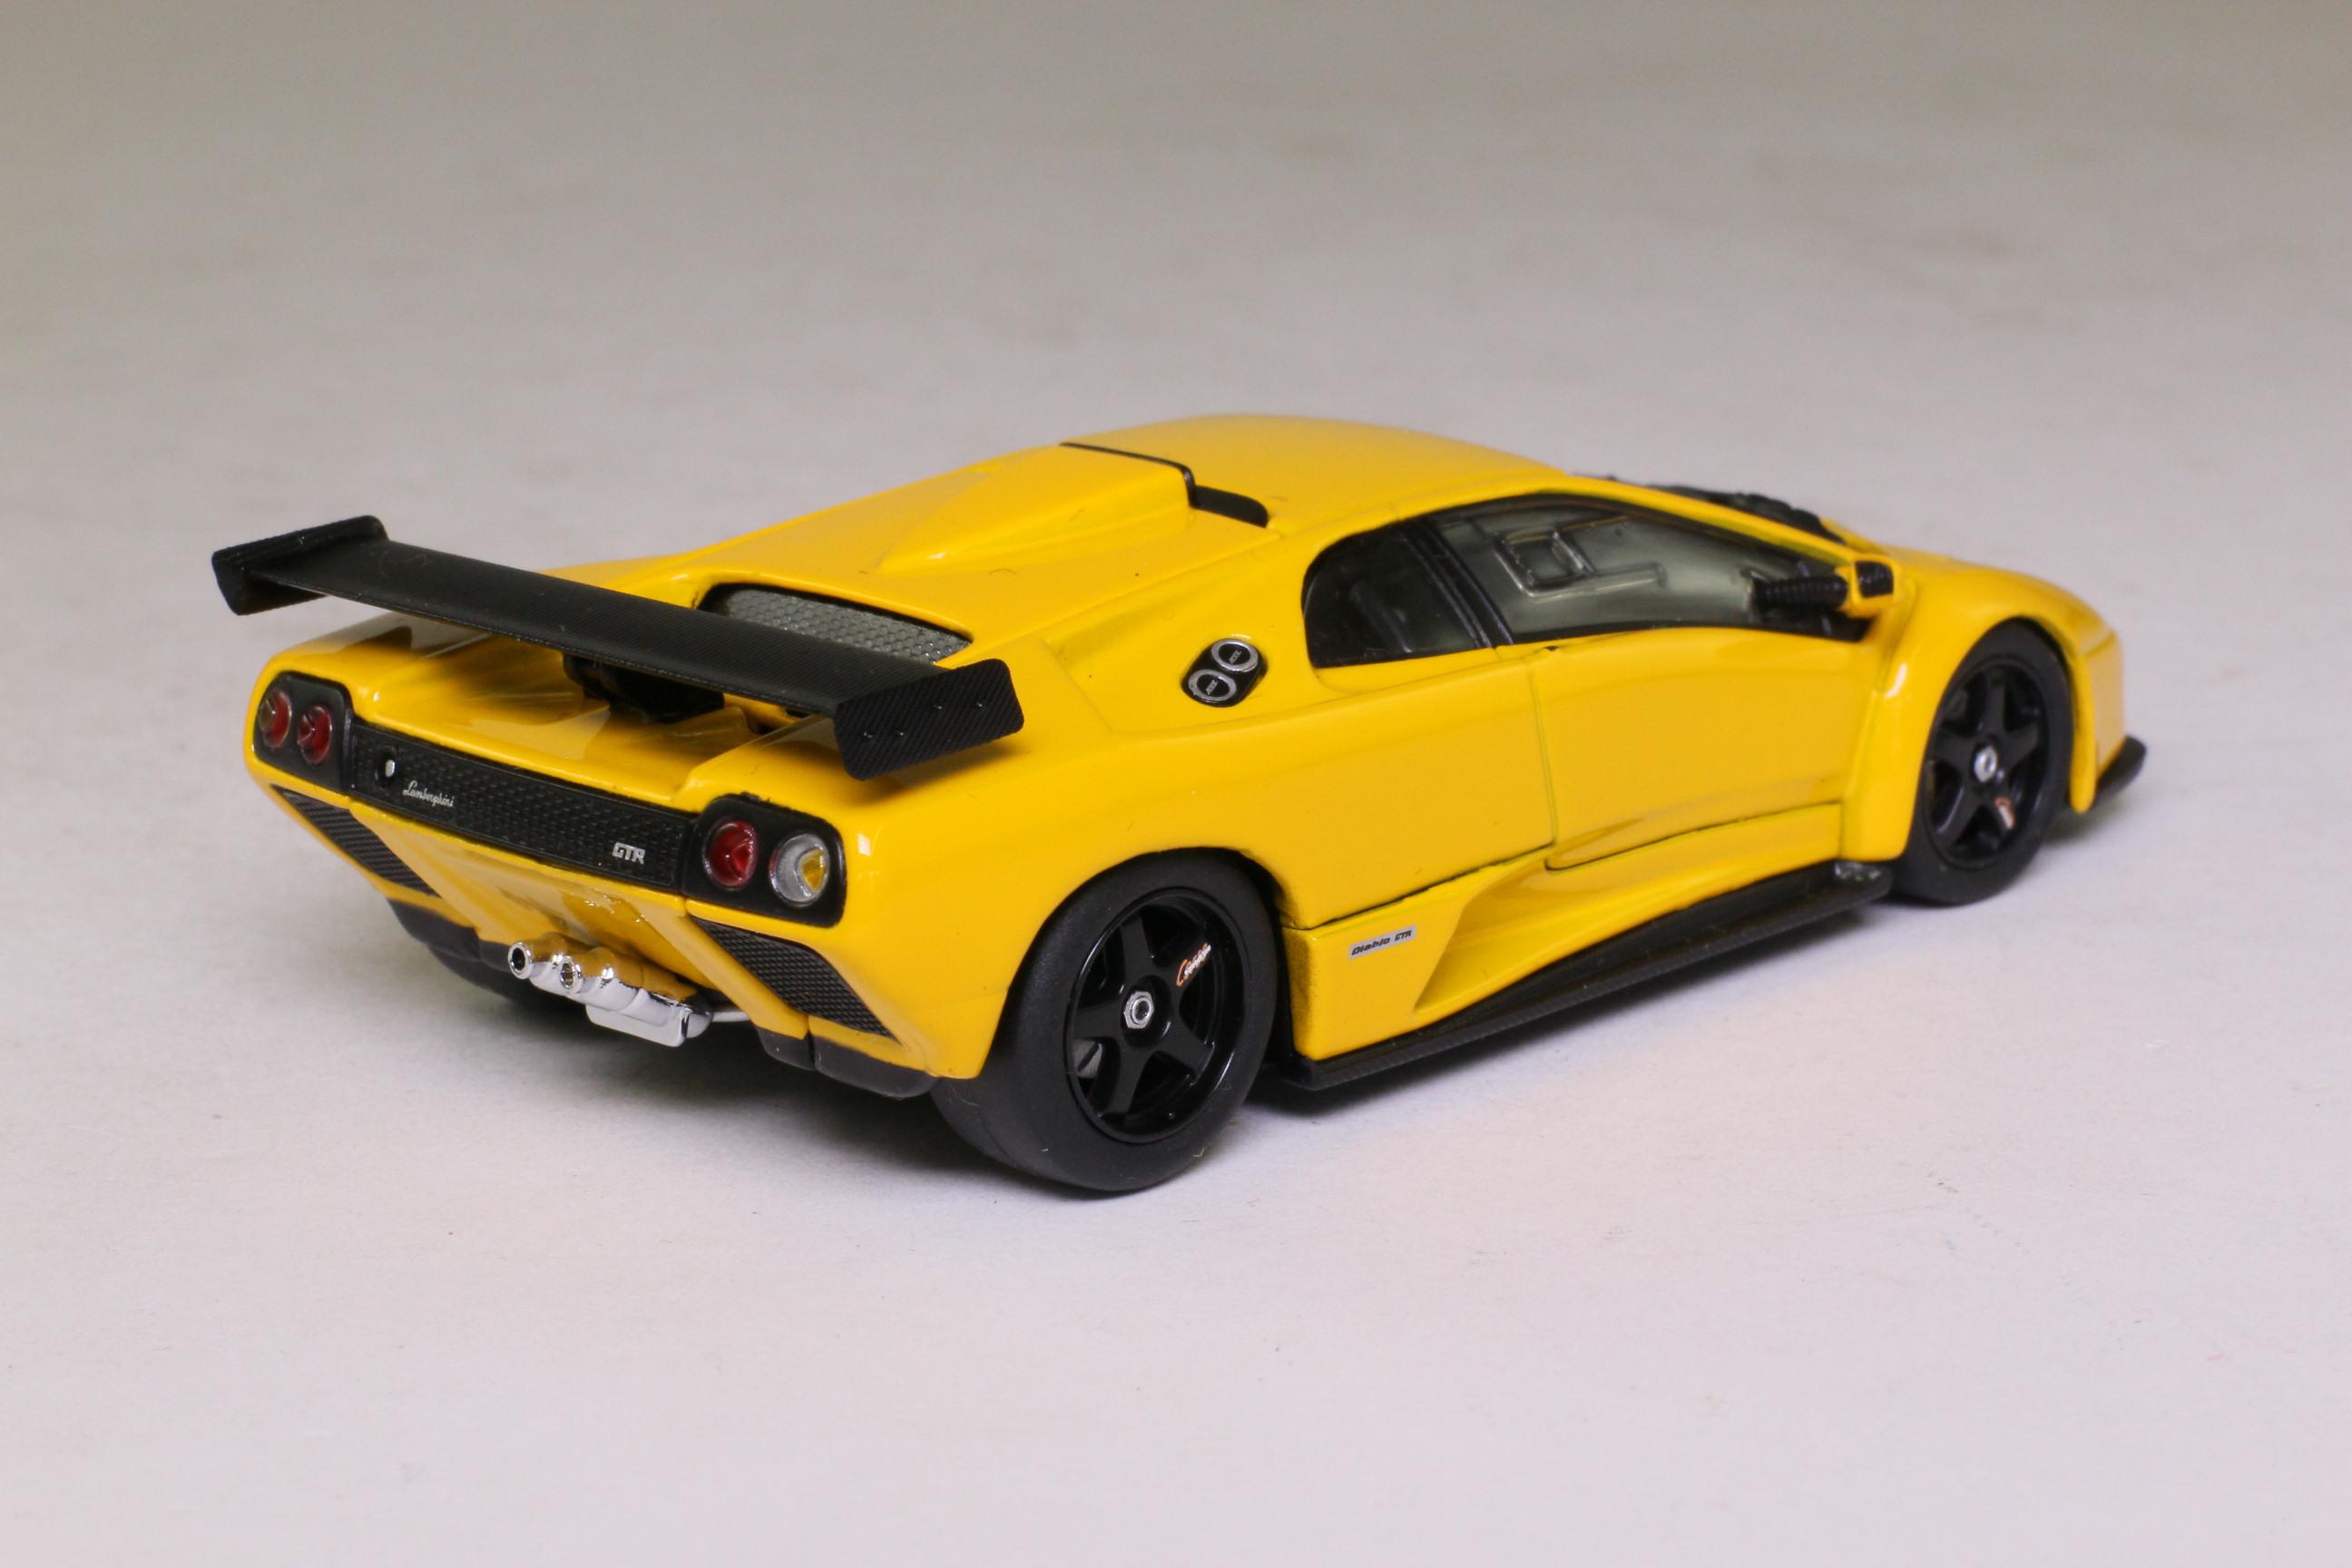 Kyosho 03215y Lamborghini Diablo Gtr S Metallic Yellow Excellent Boxed Ebay